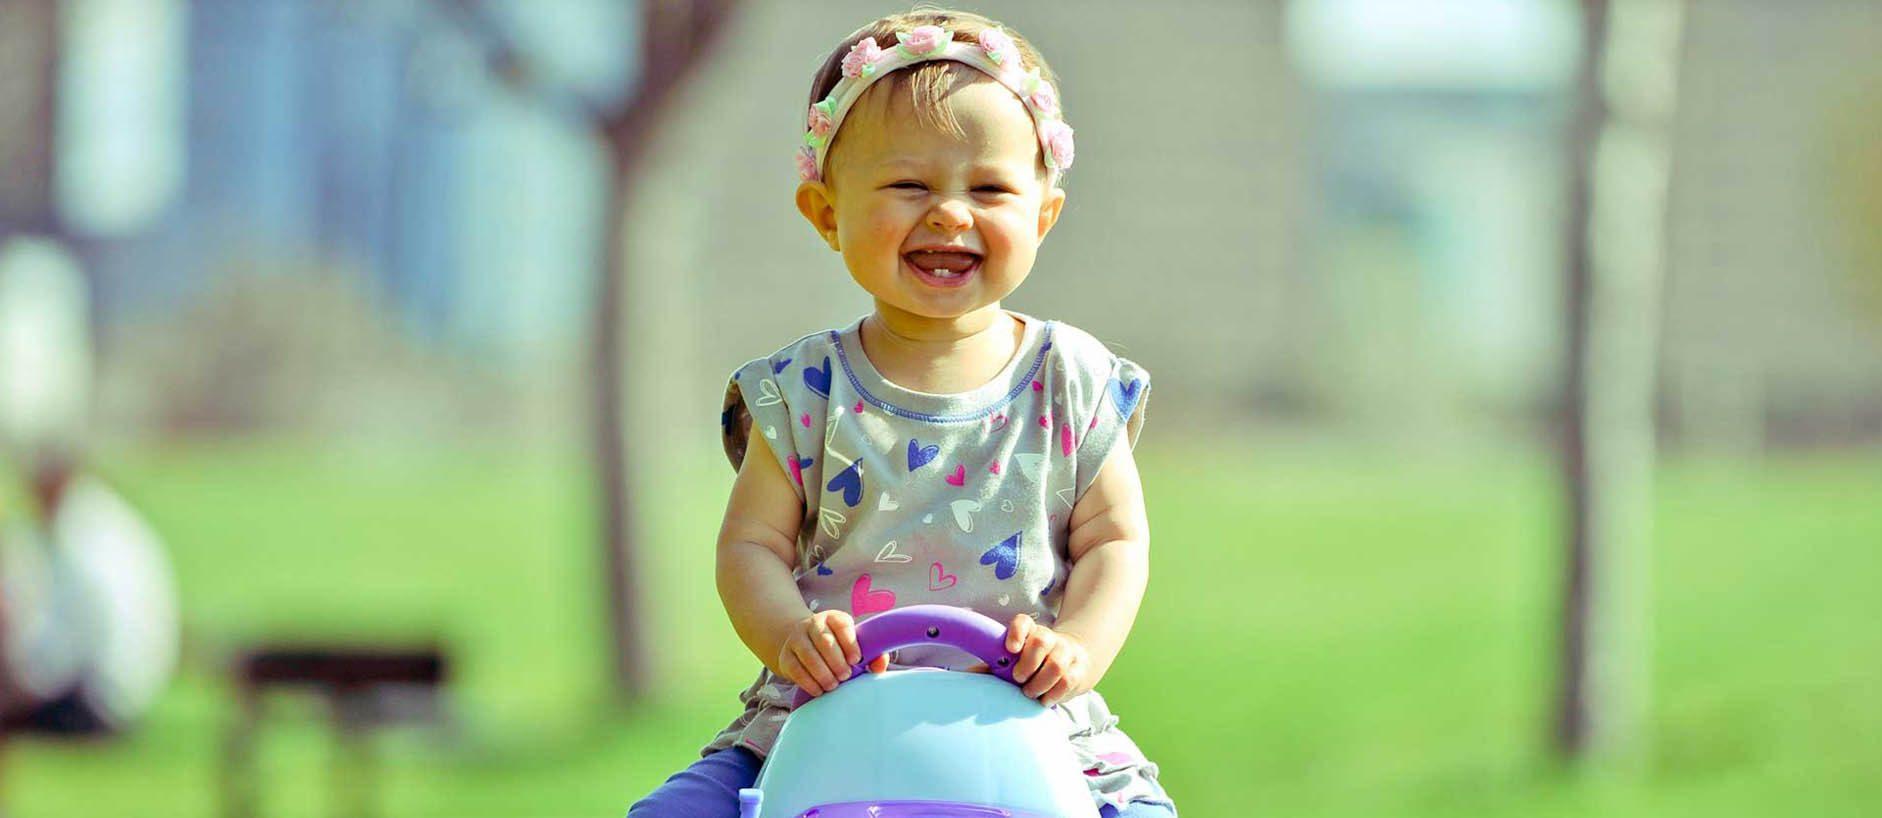 Toddler girl on plastic car laughing